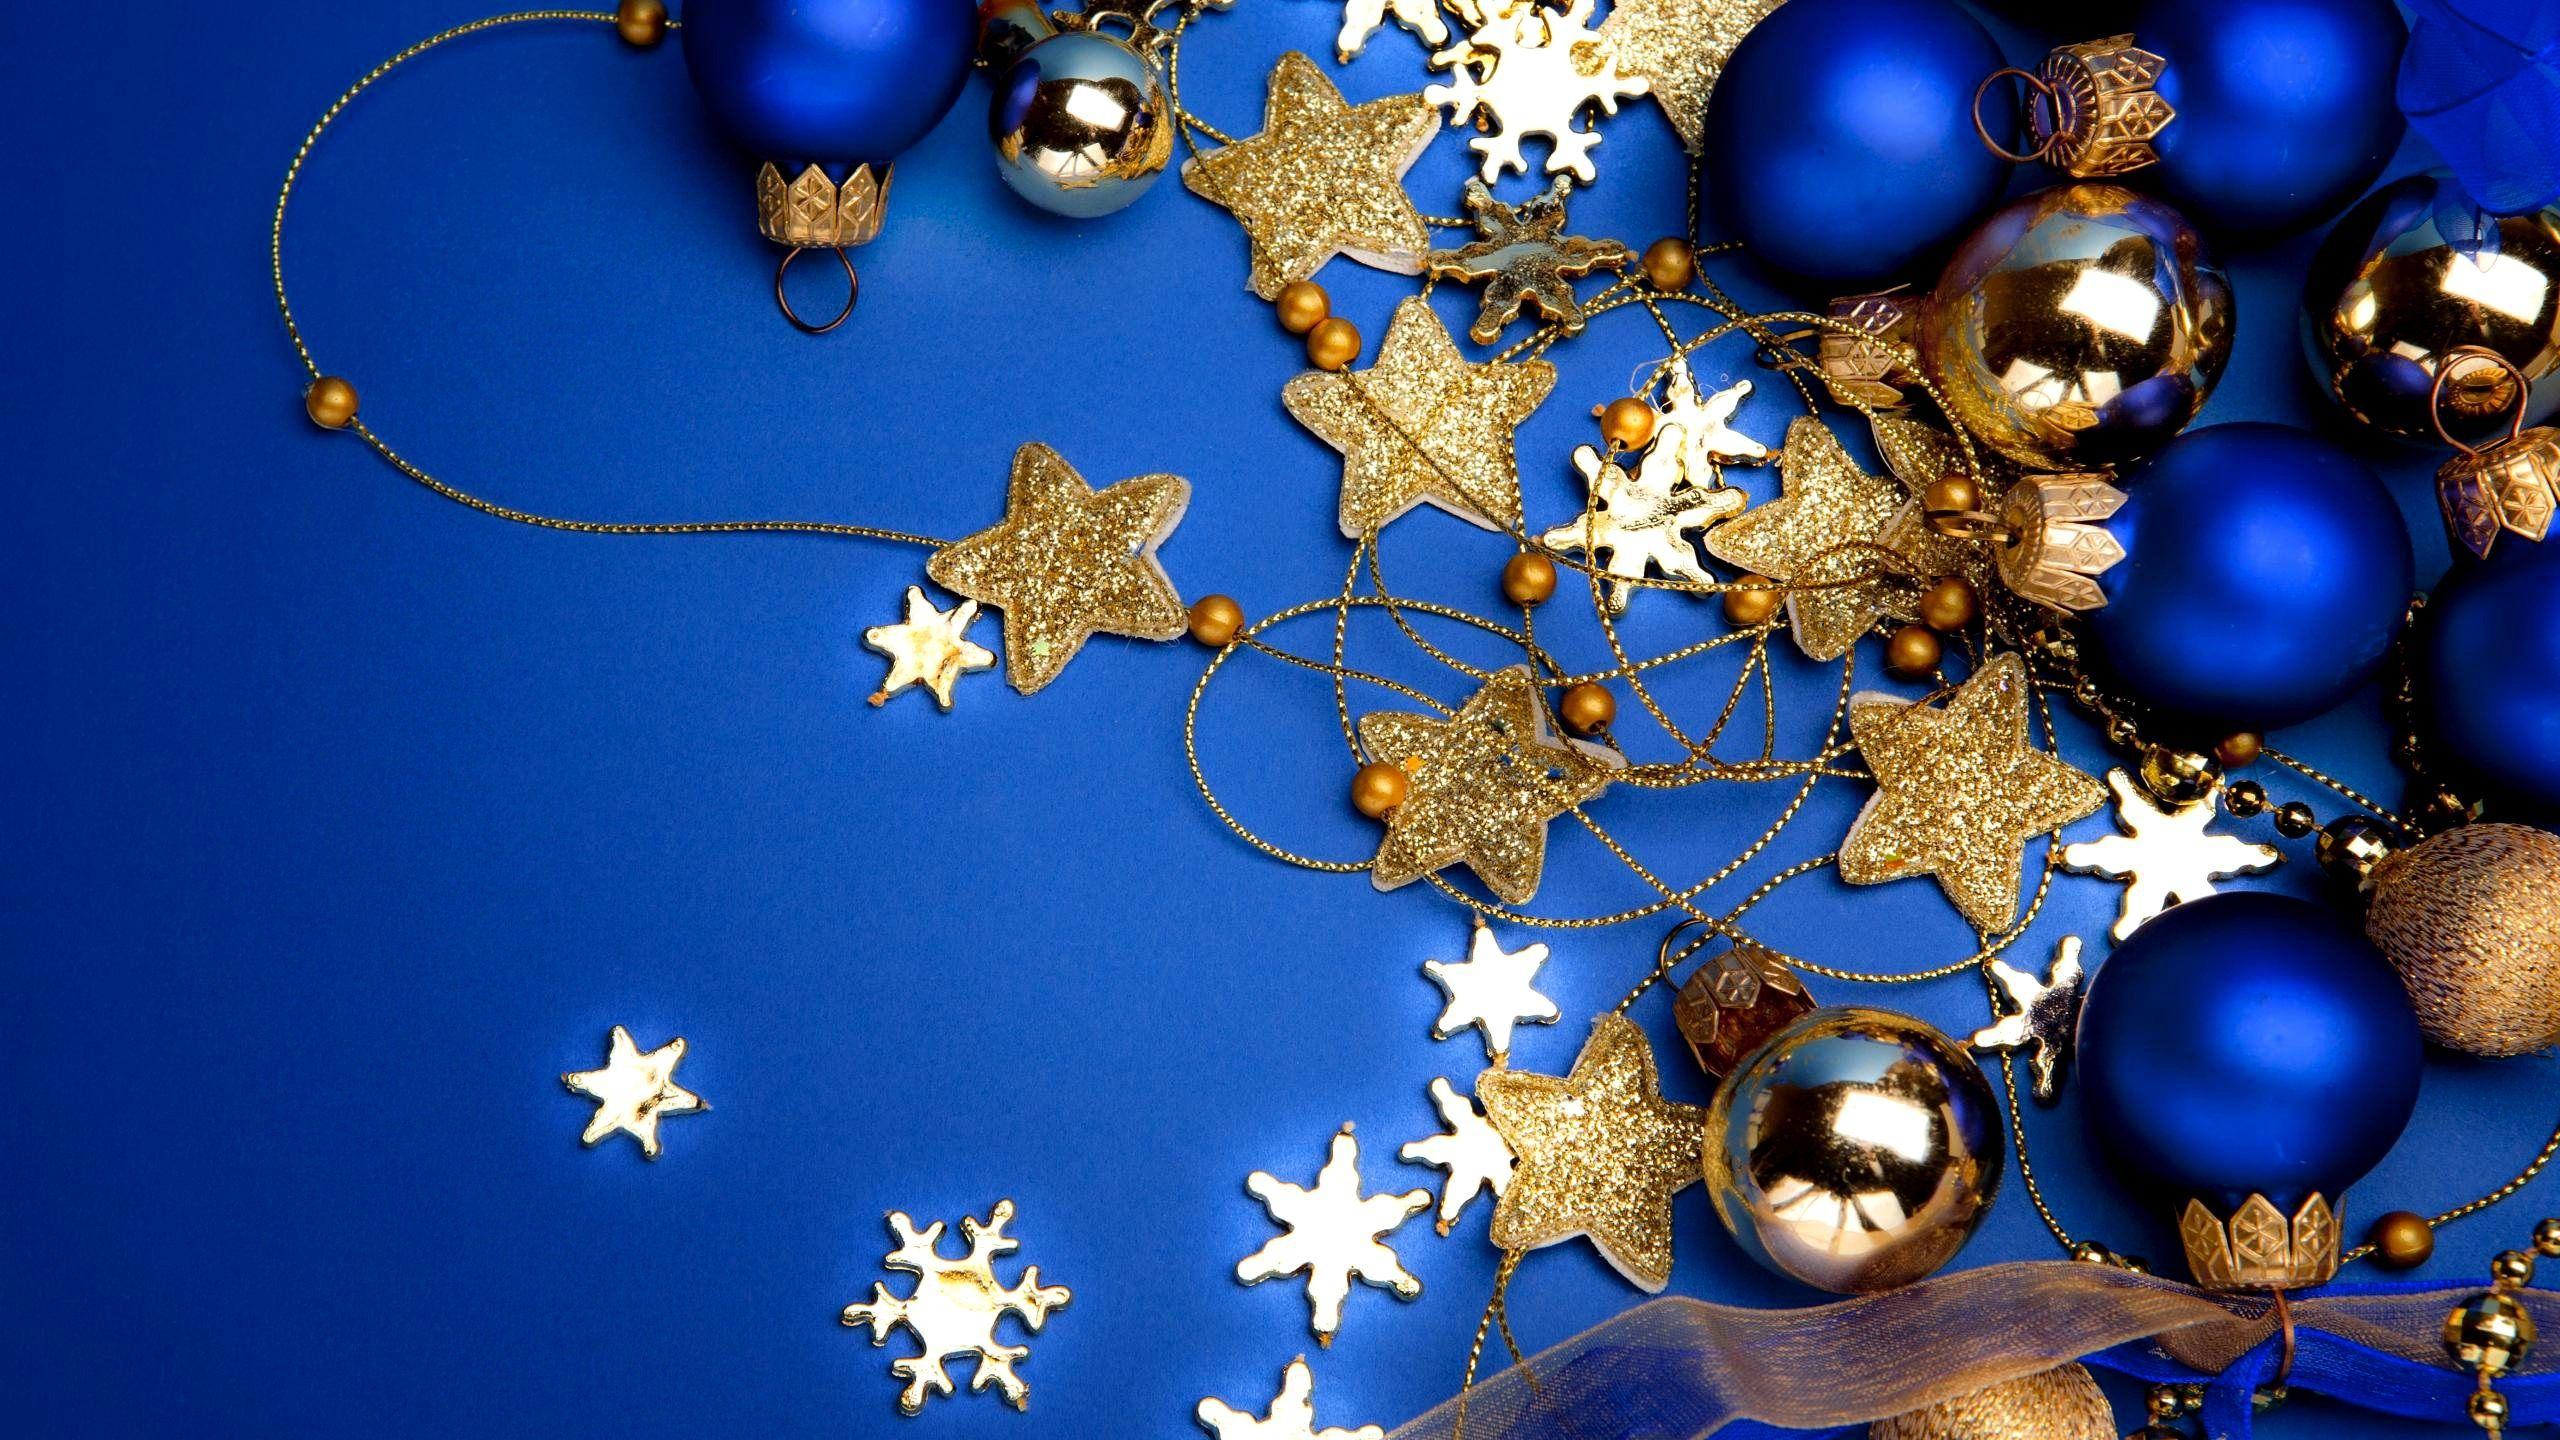 Xmas Stuff For Christmas Decorations Wallpaper Widescreen